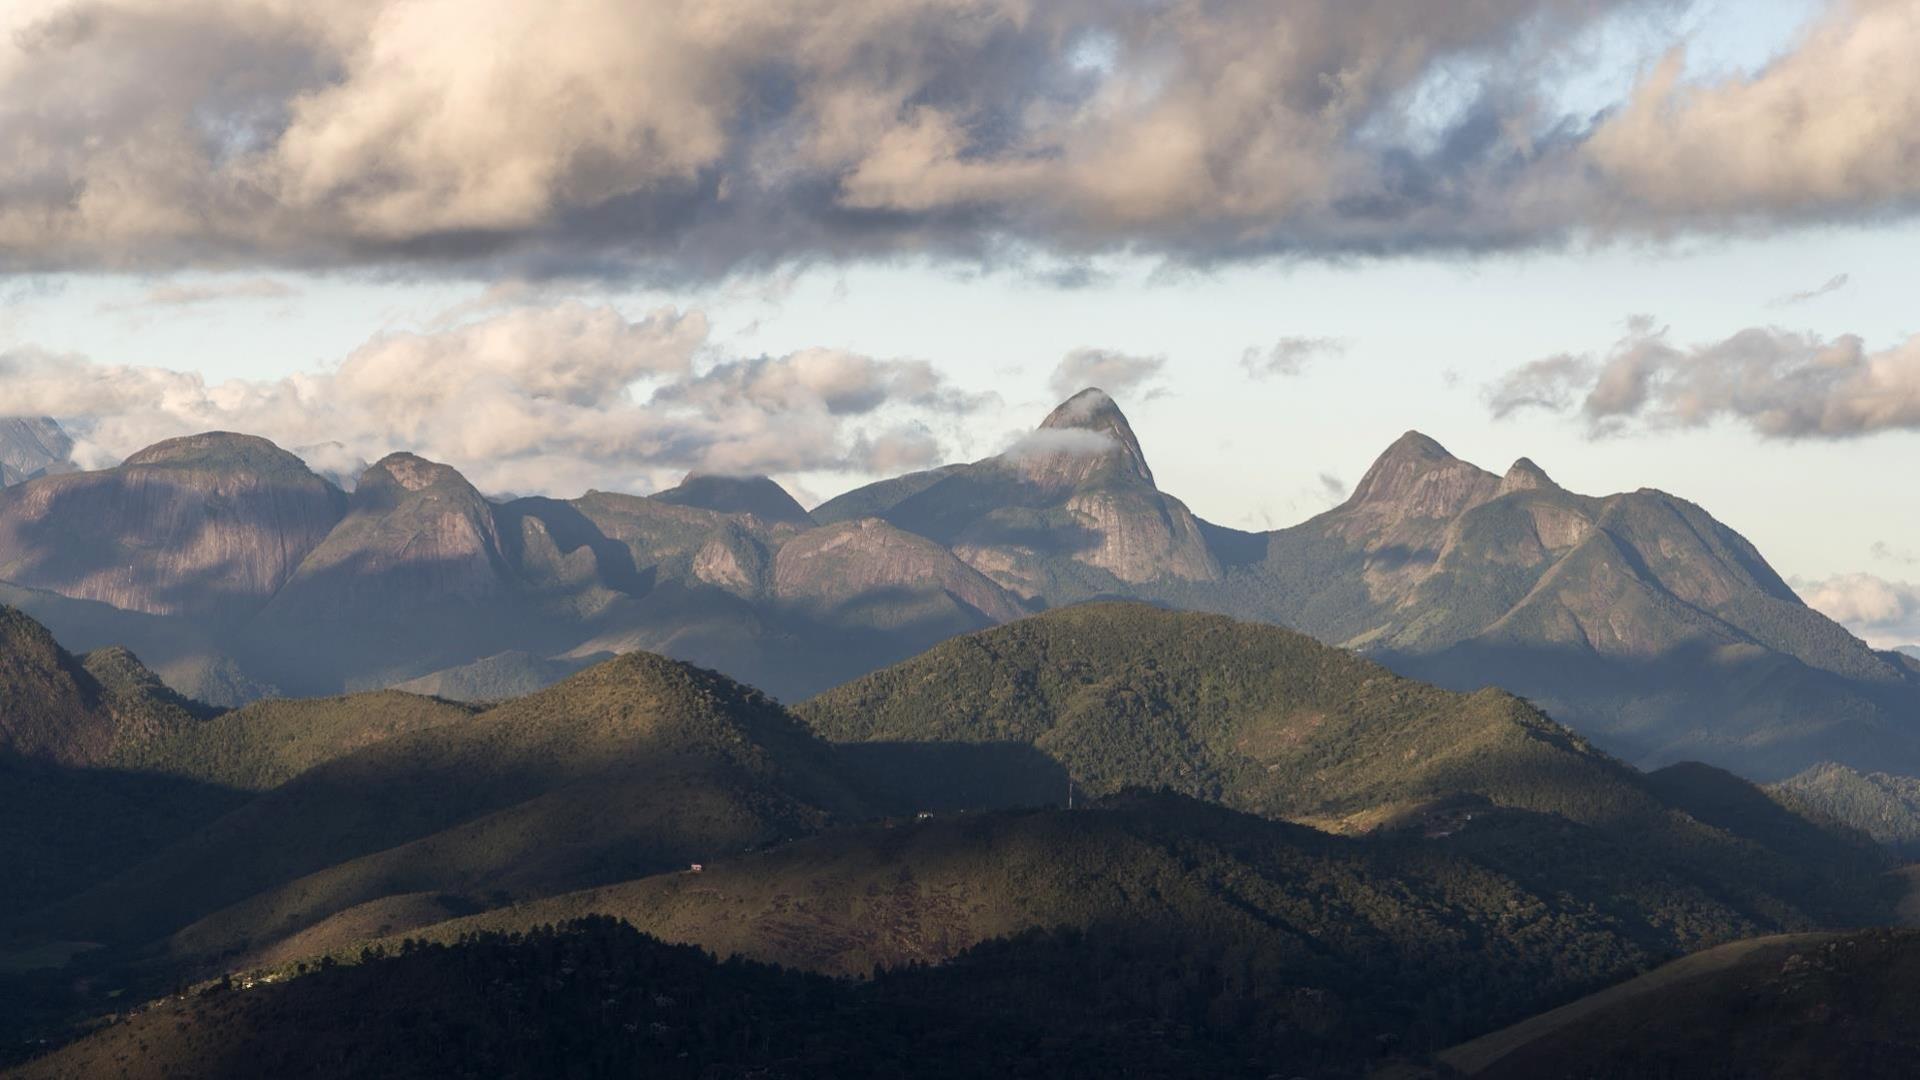 Brasilien Nova Friburgo: 3 Tage Reisebaustein - Eco Lodge Itororo naturnah erleben